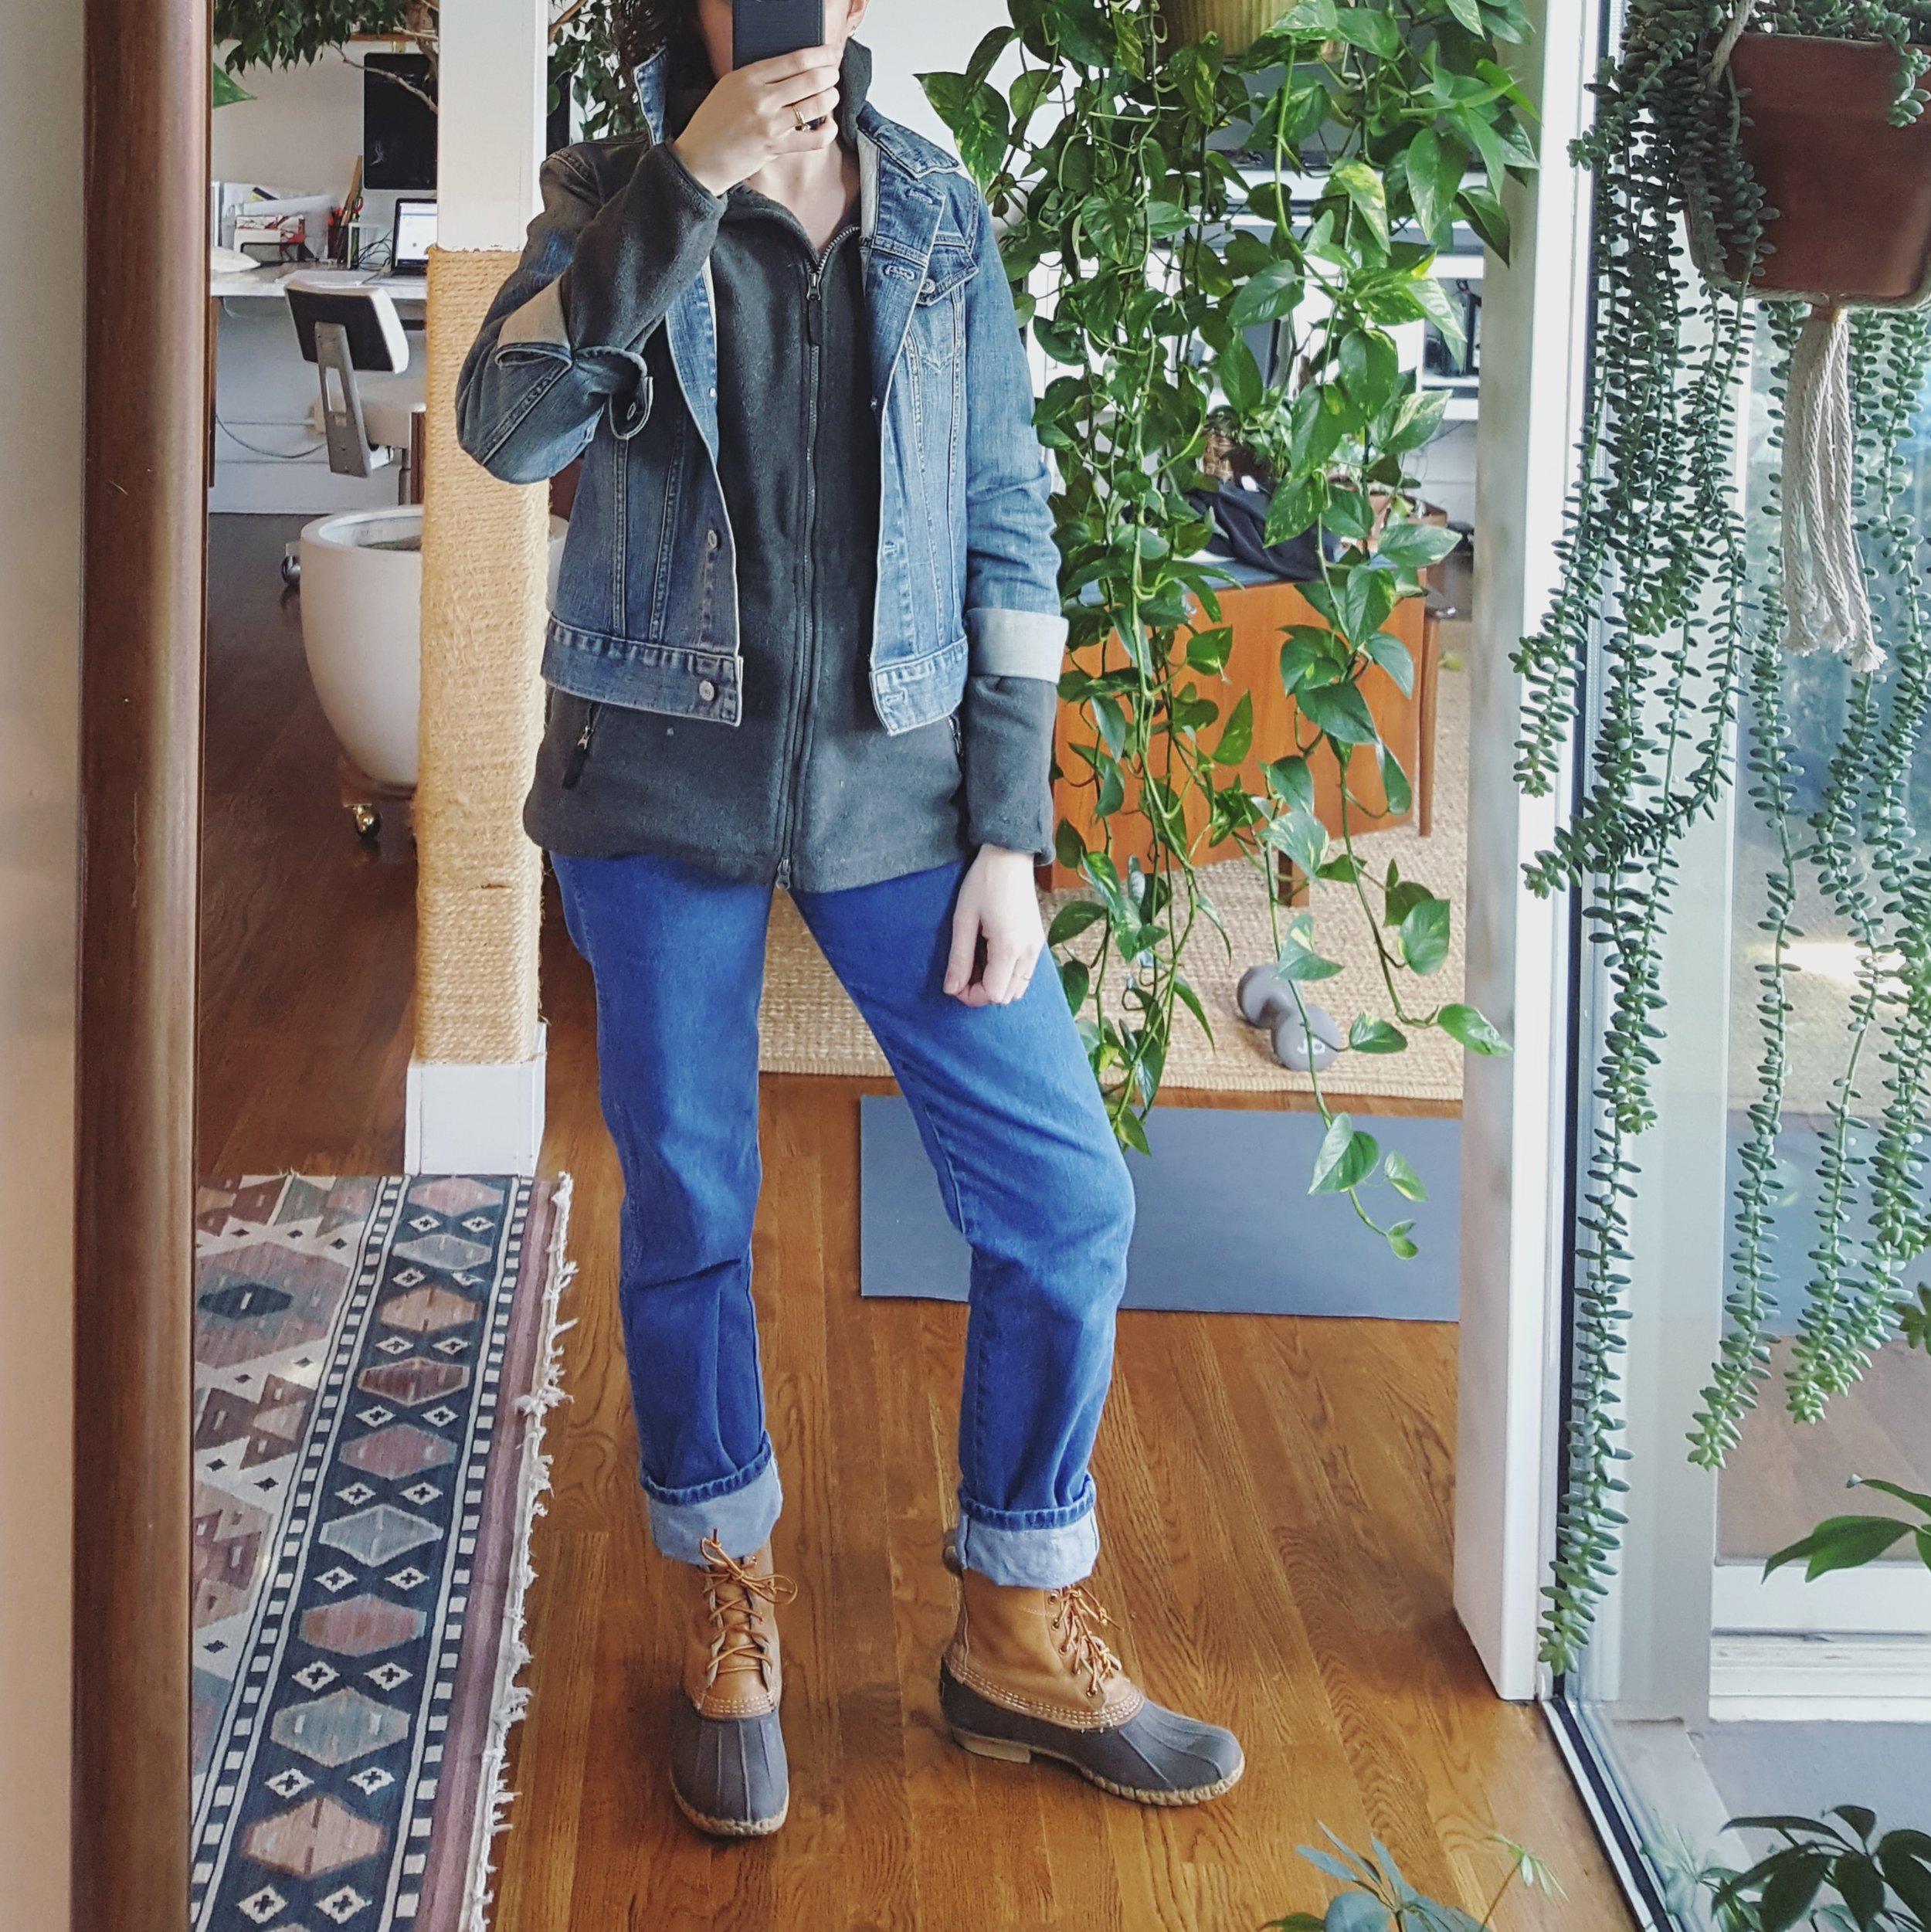 Thursday - December 28, 2017Wrangler jeans + fleece hoodie + jean jacket + L.L. Bean boots